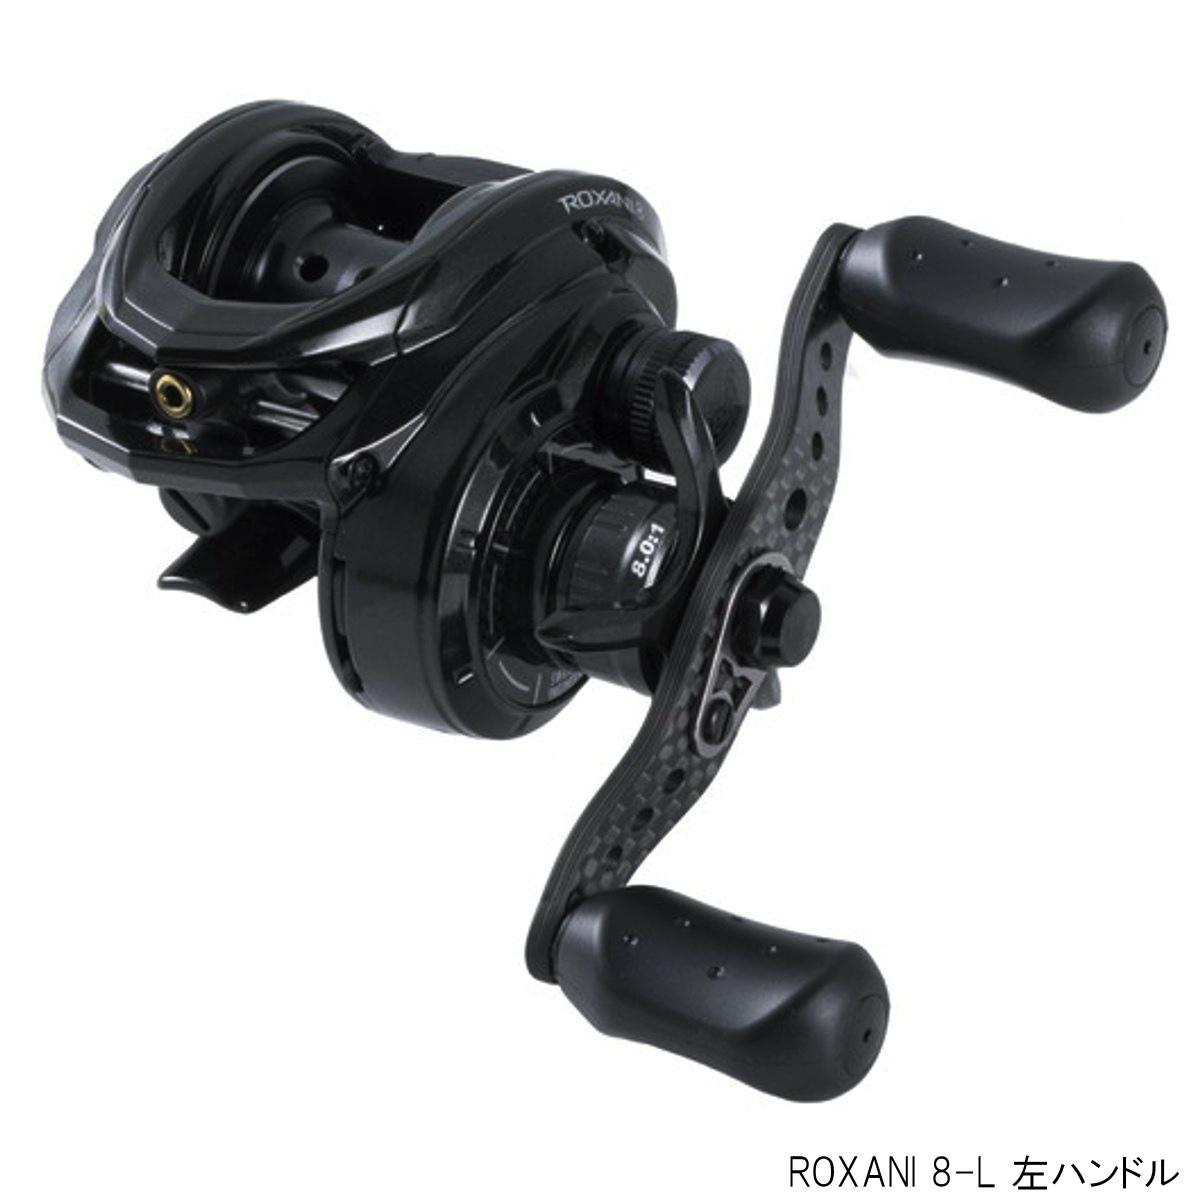 ROXANI 8-L 左ハンドル【送料無料】